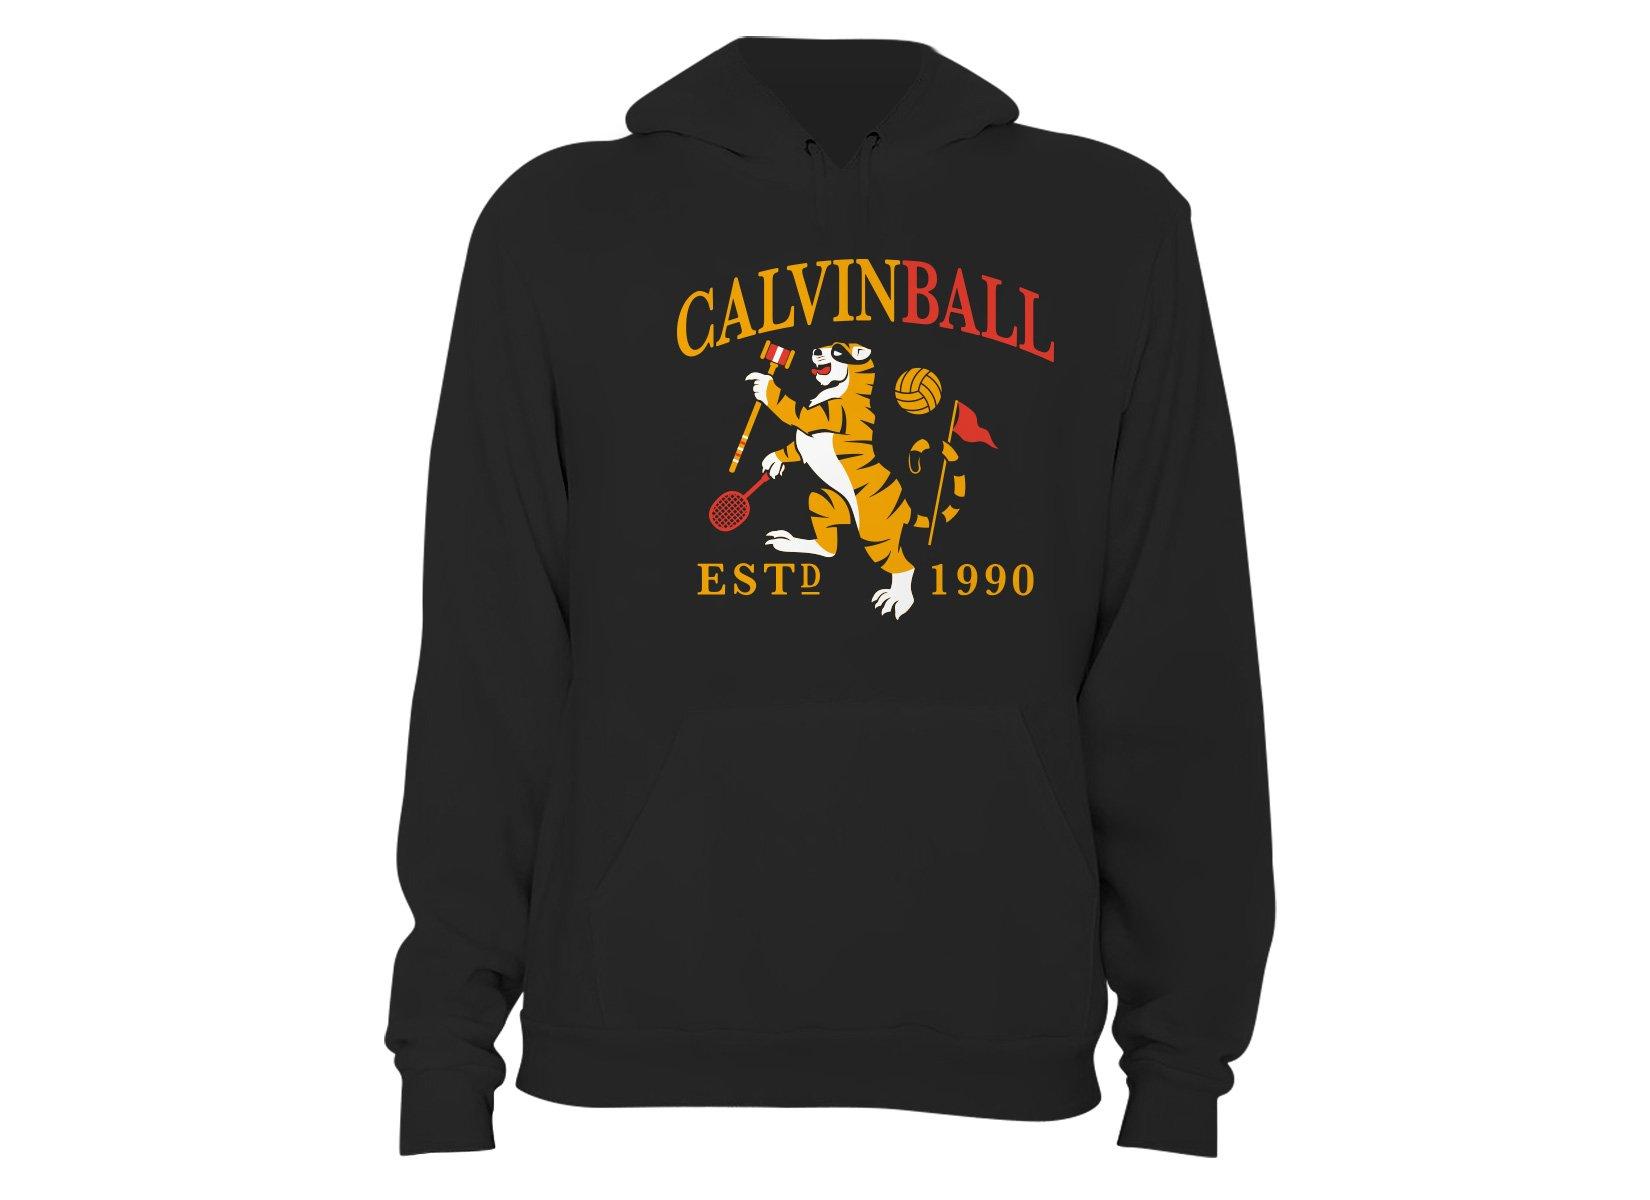 Calvinball on Hoodie